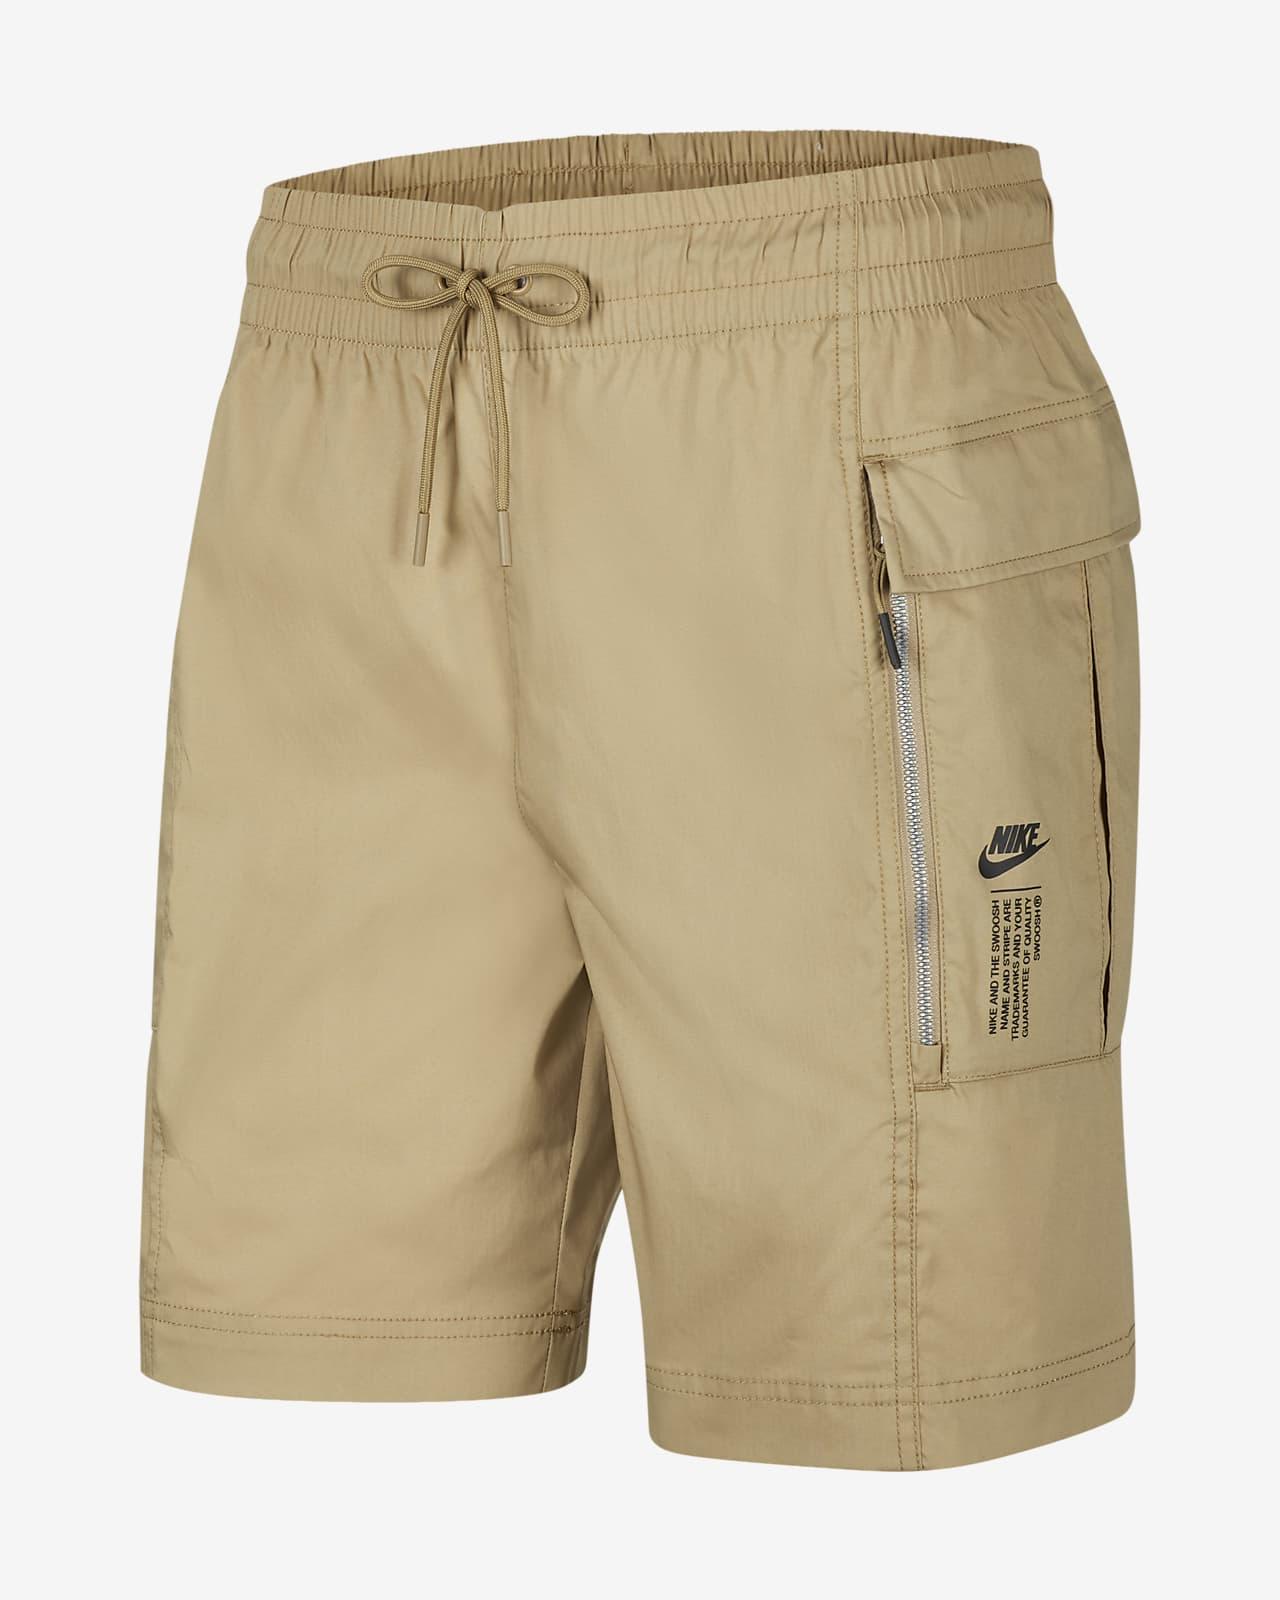 Nike Sportswear 男子梭织工装短裤